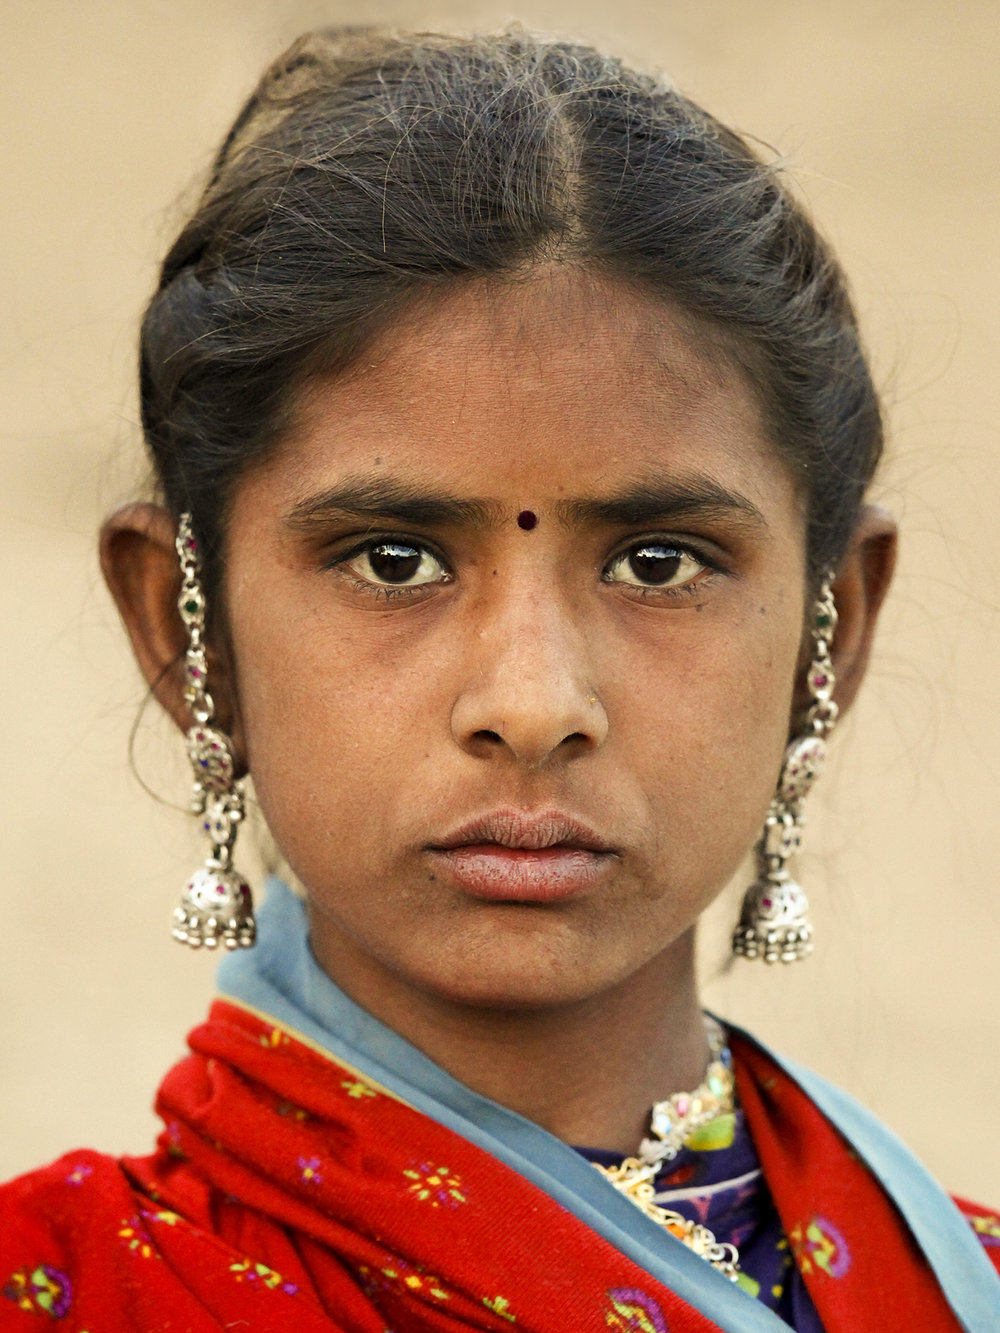 Brian_Jones_Women of India_Women of India - Rajasthan 2_2.jpg